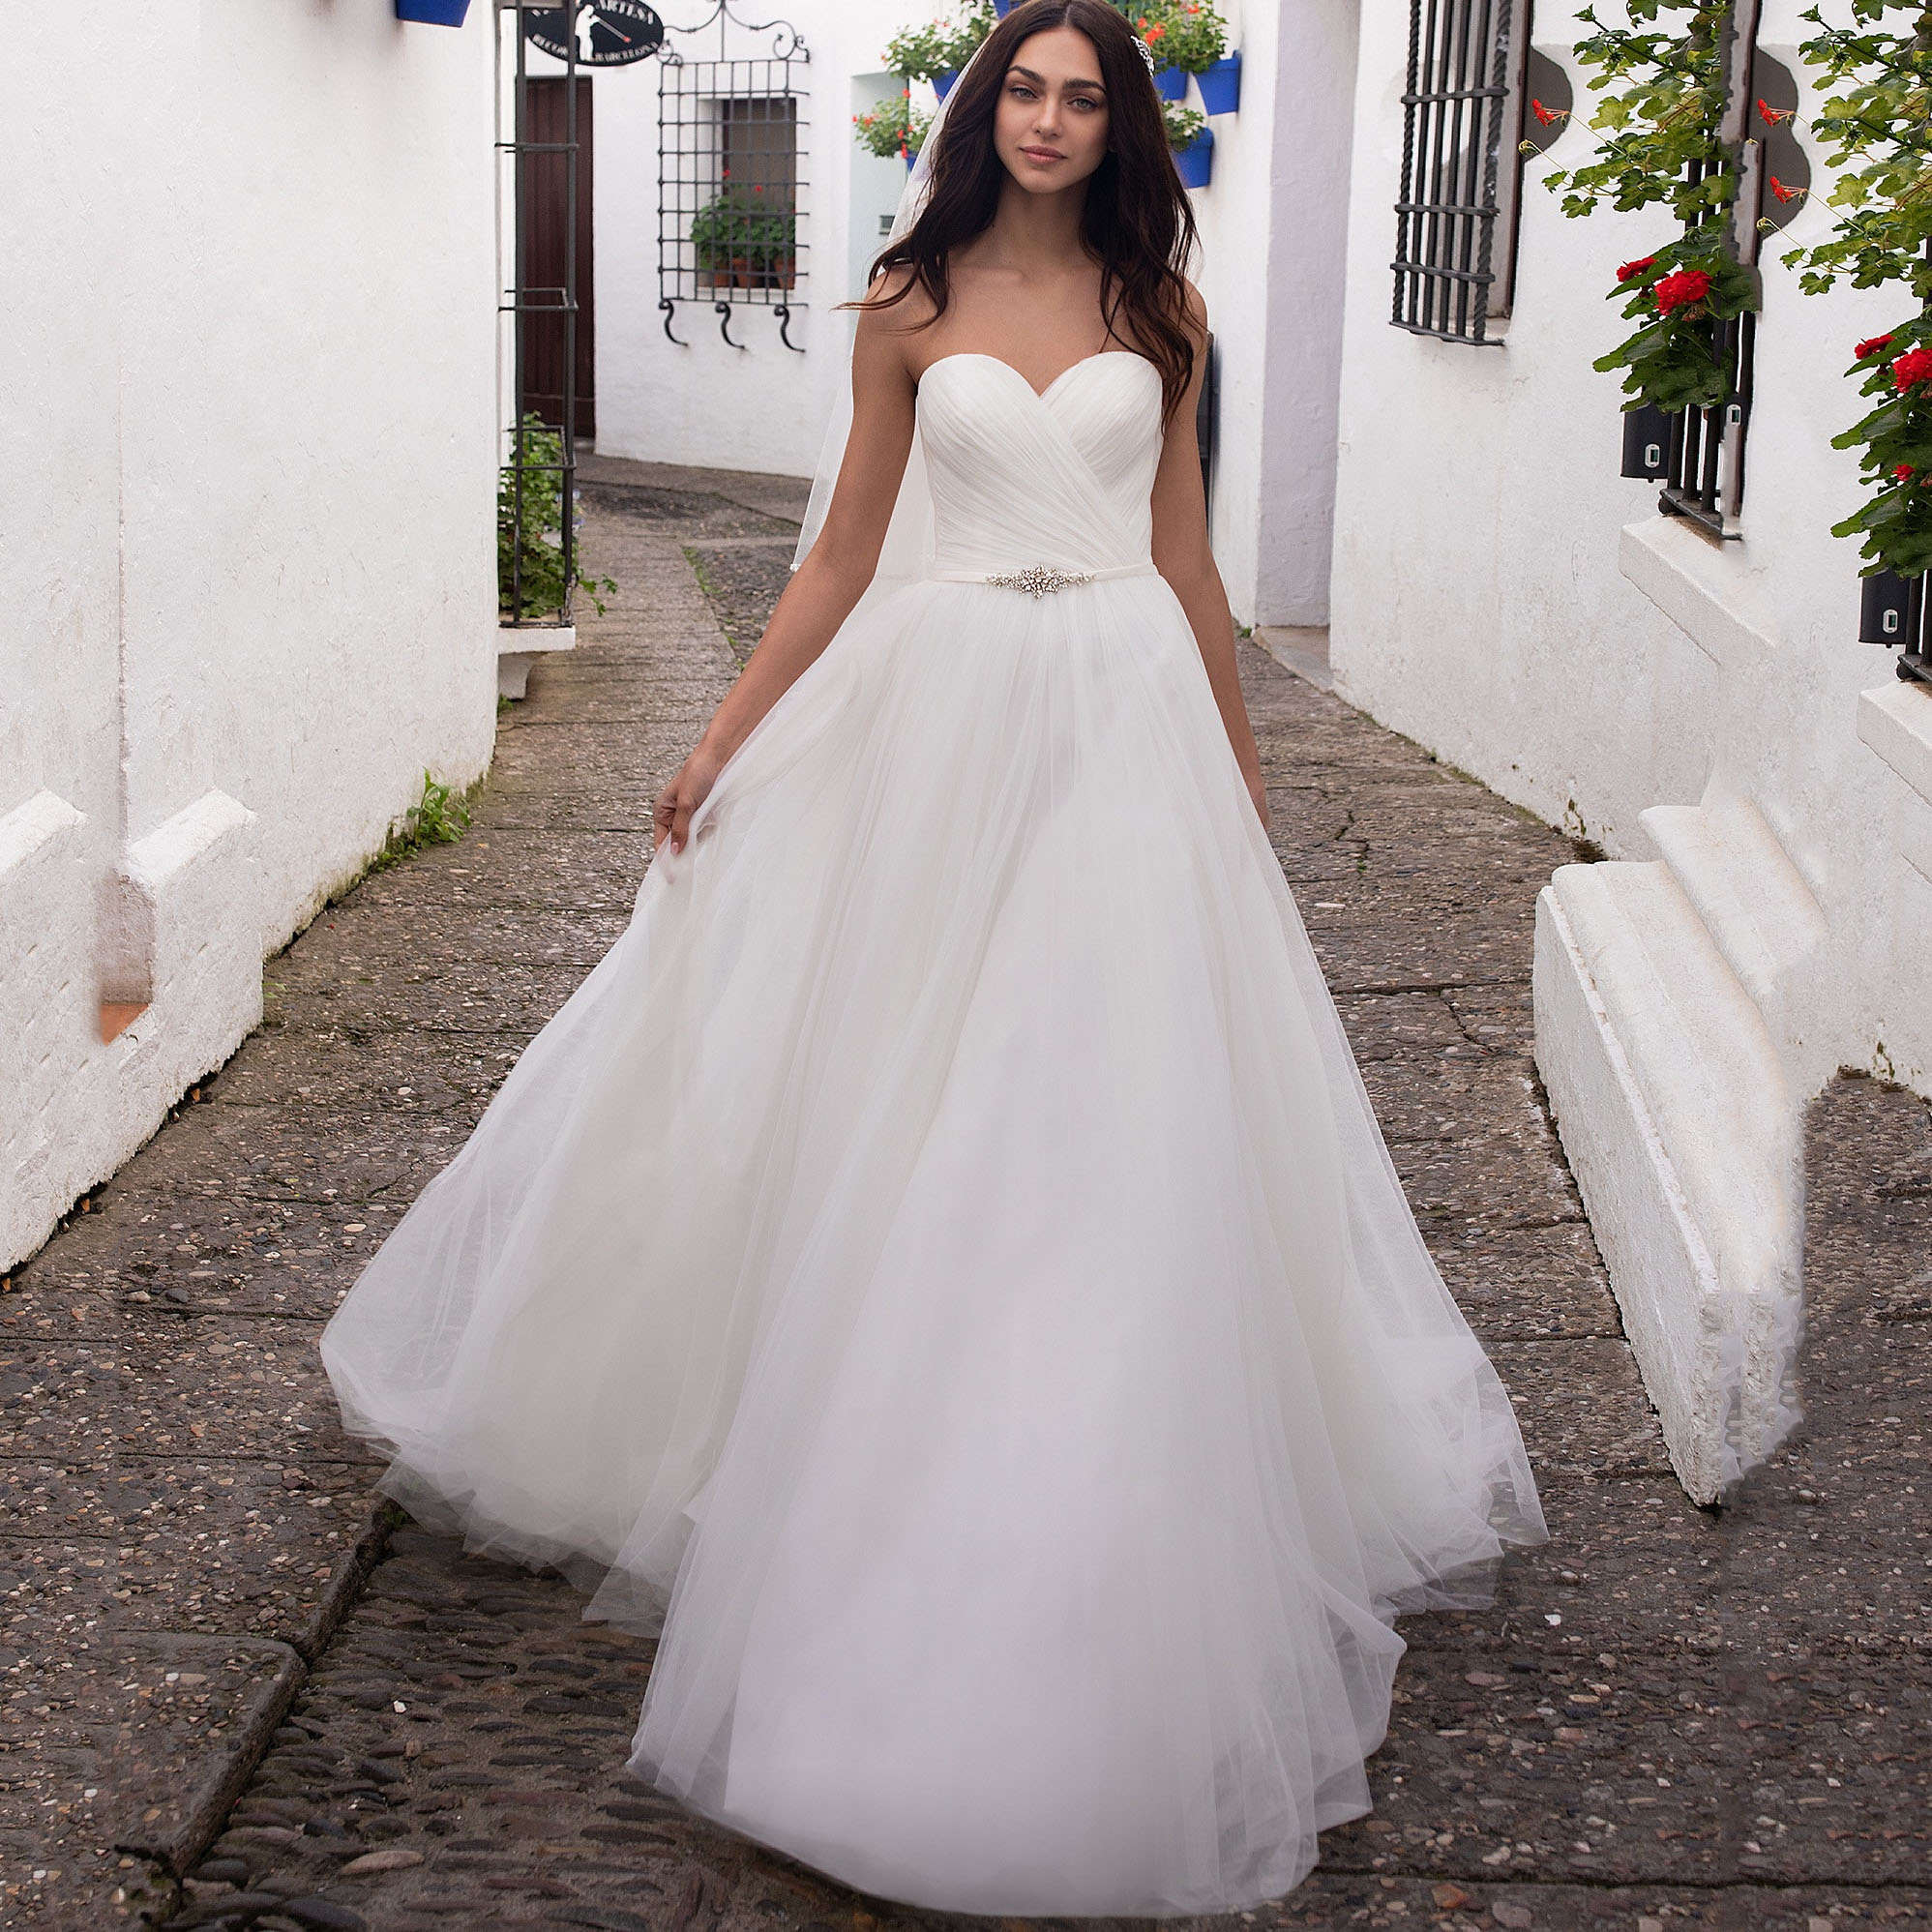 Sweetheart Neckline Wedding Dress 2019 Off The Shoulder Beach Boho Bride Gown A-line Vestido De Noiva Customized